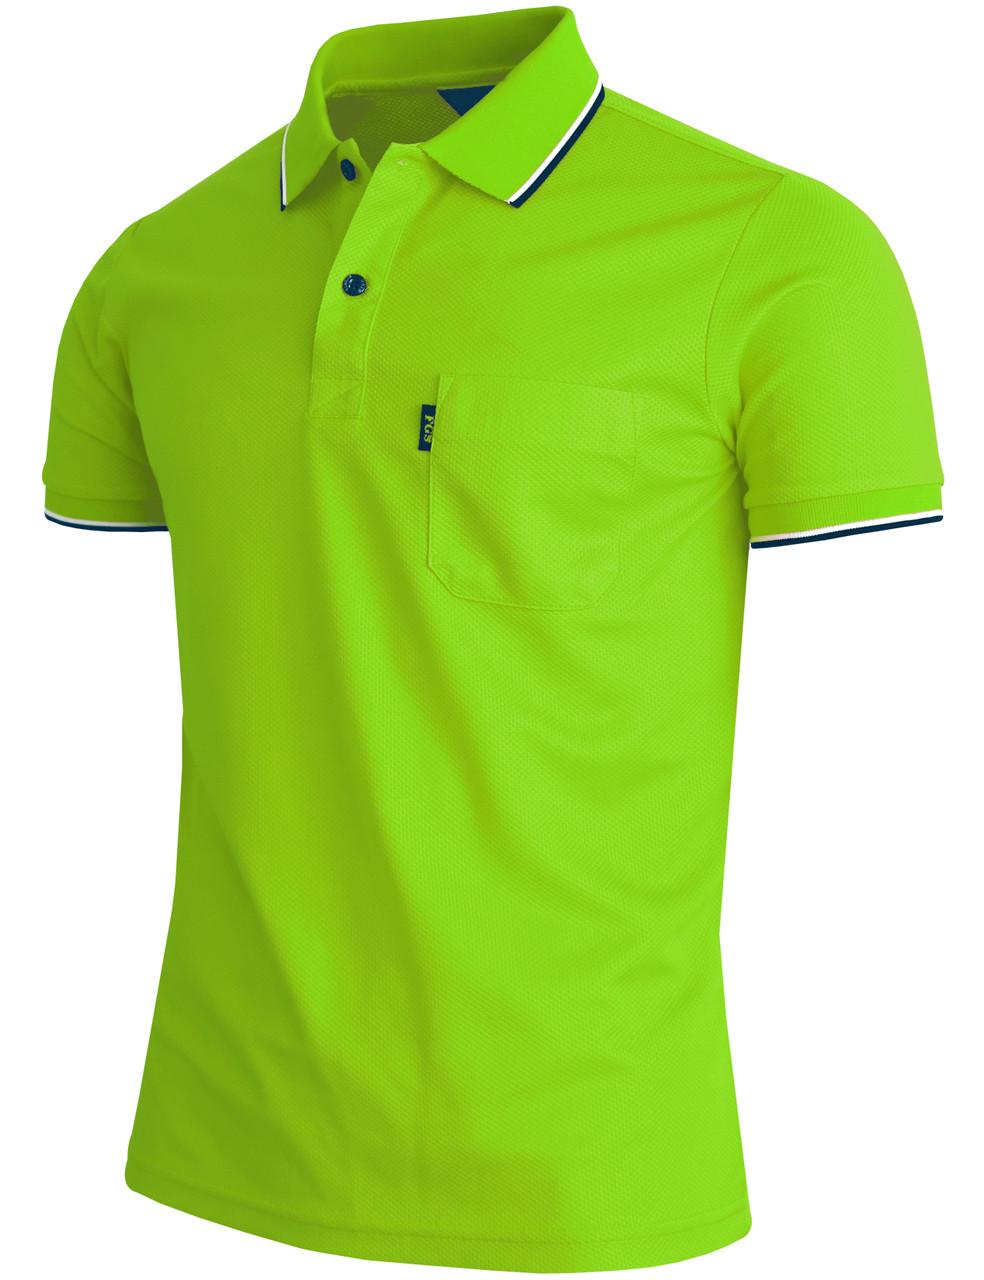 Short Sleeve Dri Fit Point Button Polo Shirt Unisex